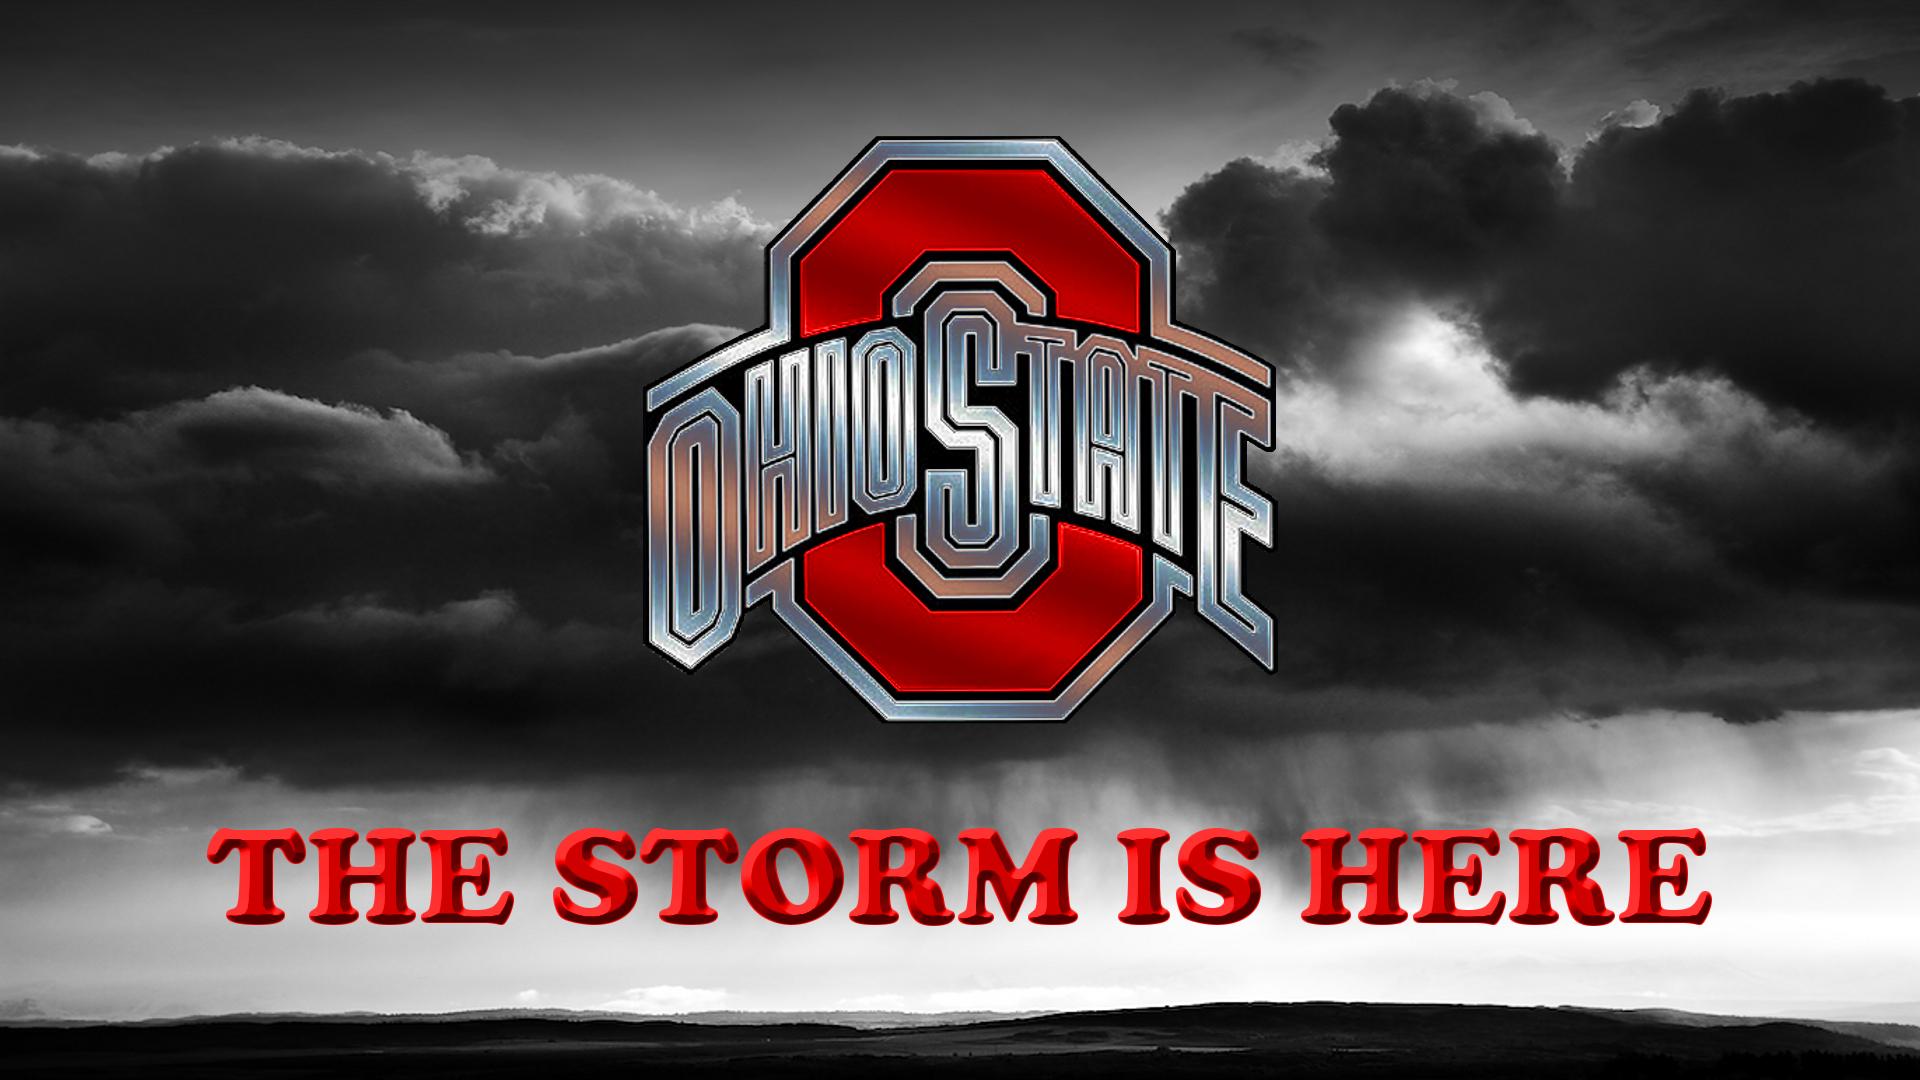 Ohio State Logo Wallpaper: Ohio State Buckeyes Backgrounds